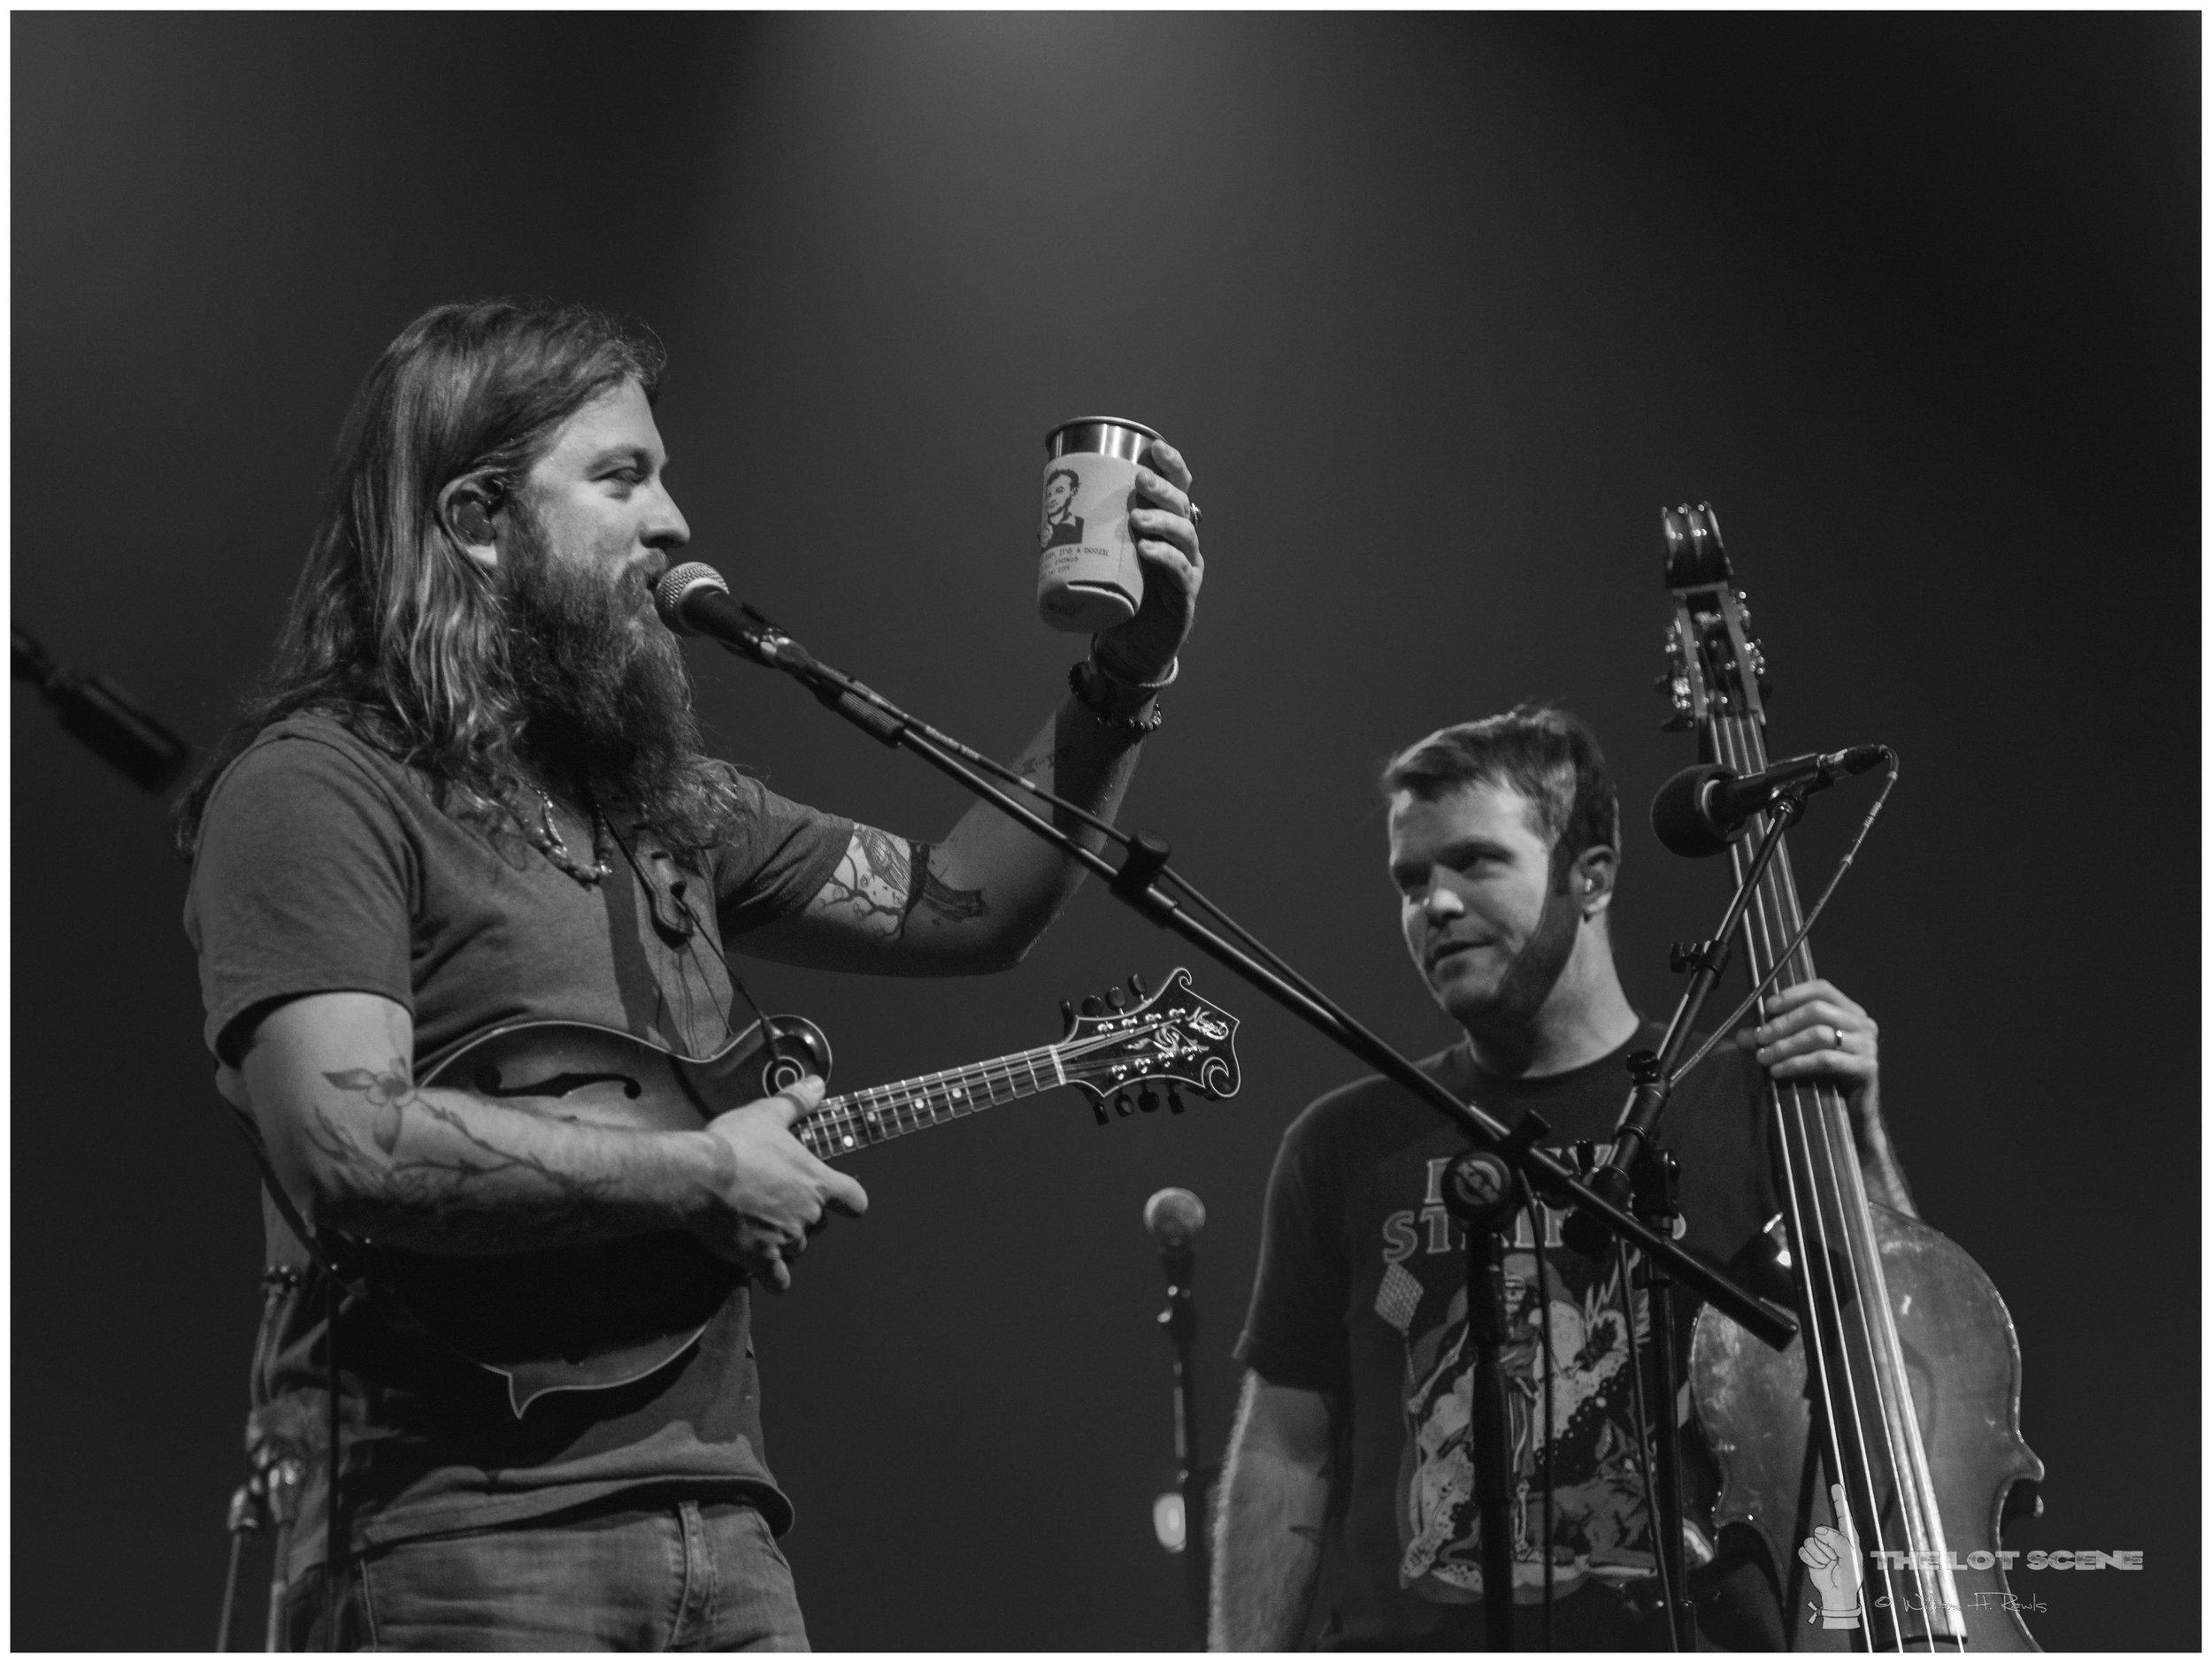 Greensky Bluegrass at The Anthem DC - February 2 2019 - 3.jpg